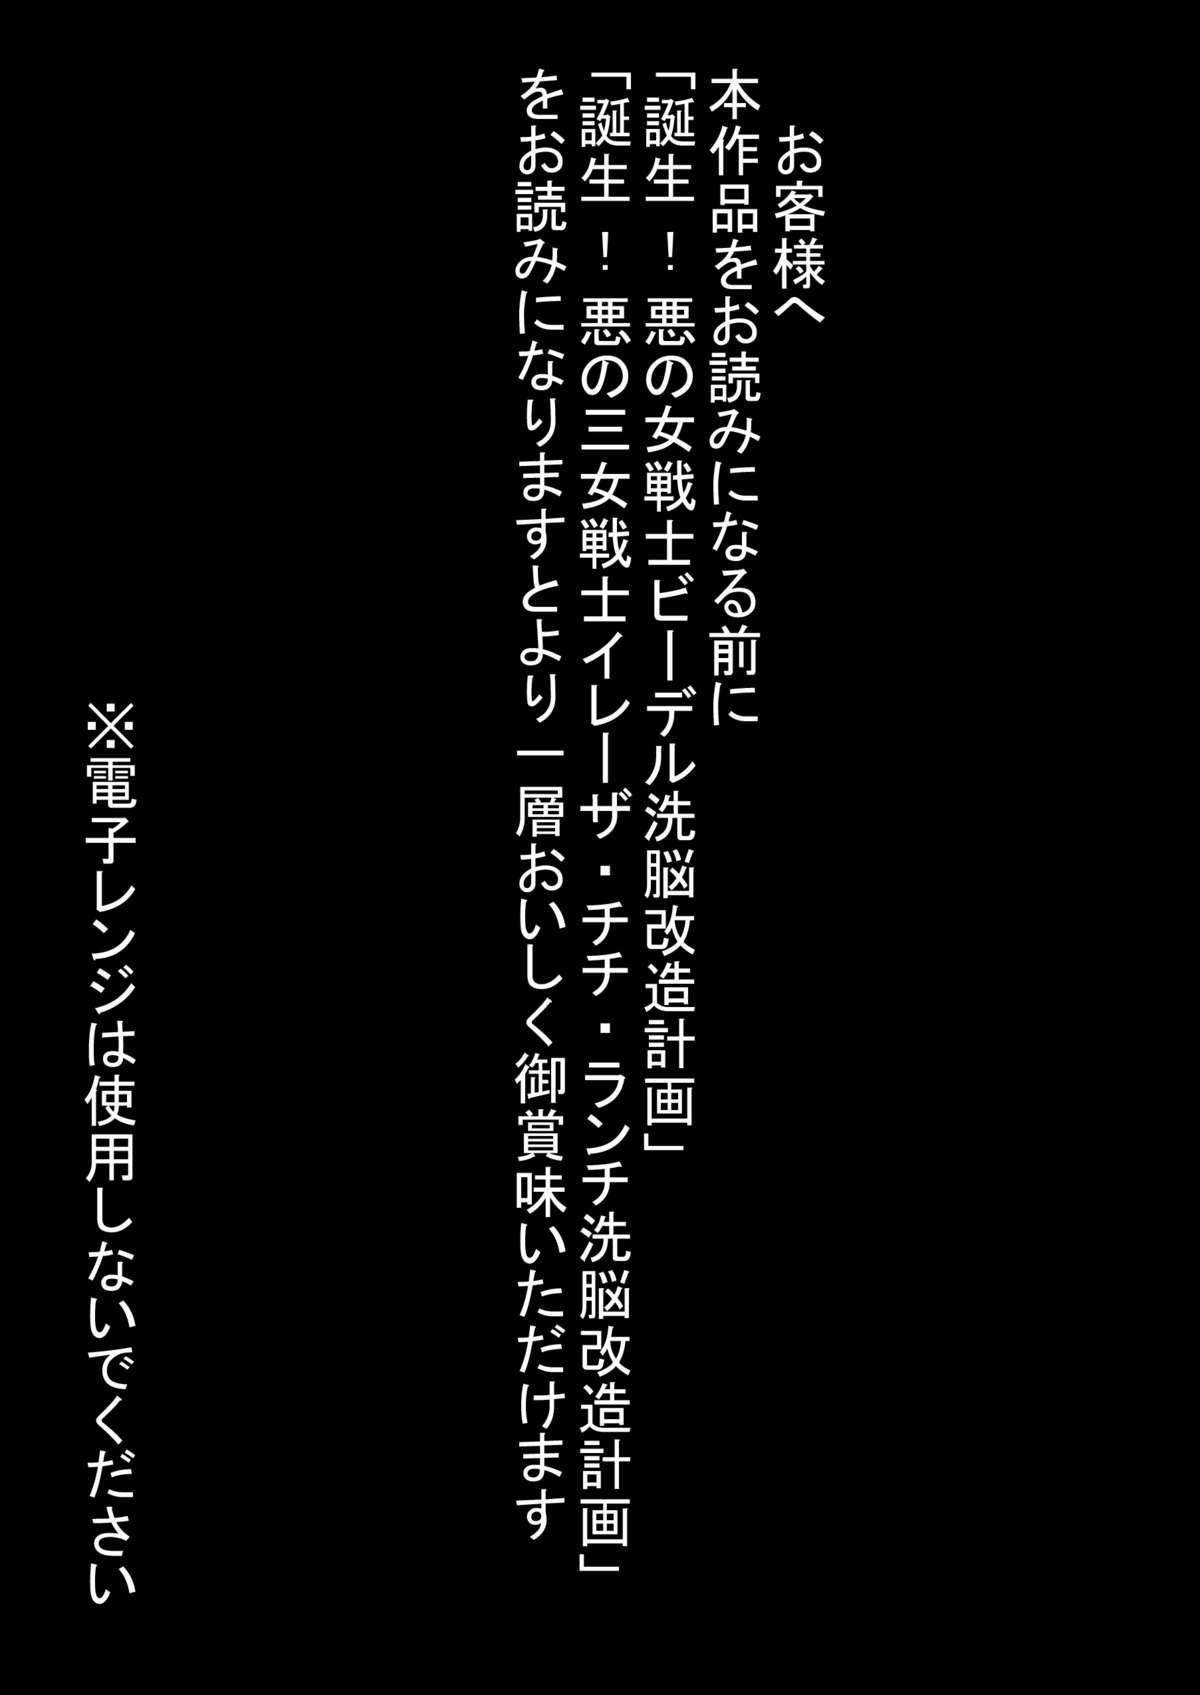 [Light Rate Port Pink] Tanjou!! Aku no Onna Senshi Jinzou Ningen 18-gou Sennou Kaizou Keikaku -Joshou- (Dragon Ball Z) 1